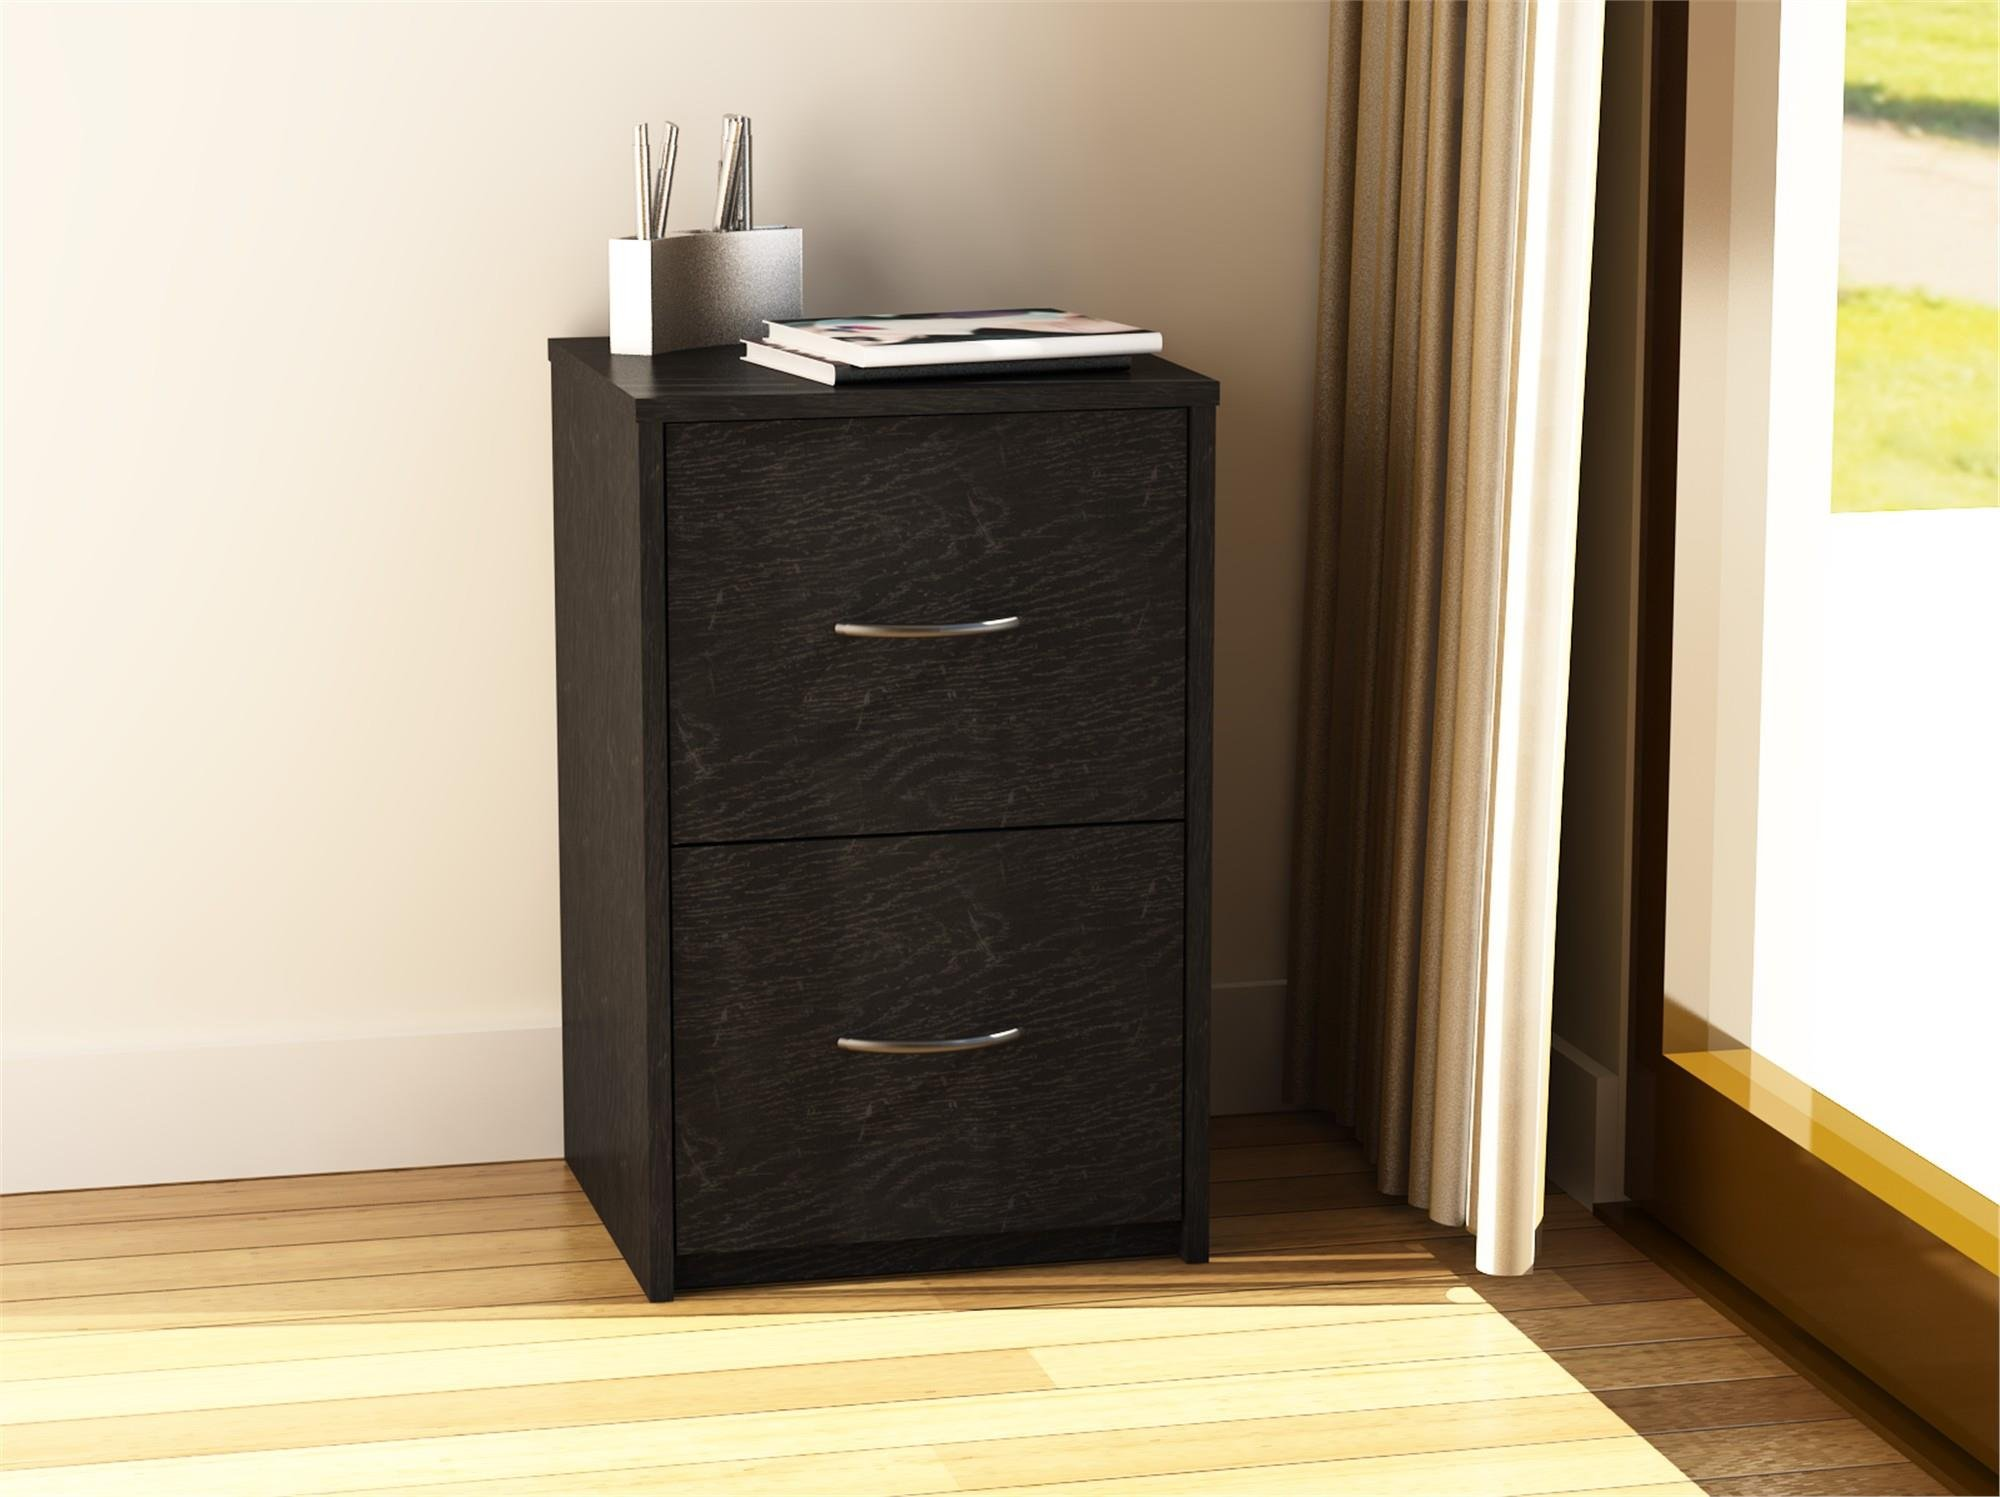 Ameriwood Home Core 2 Drawer File Cabinet, Black Oak